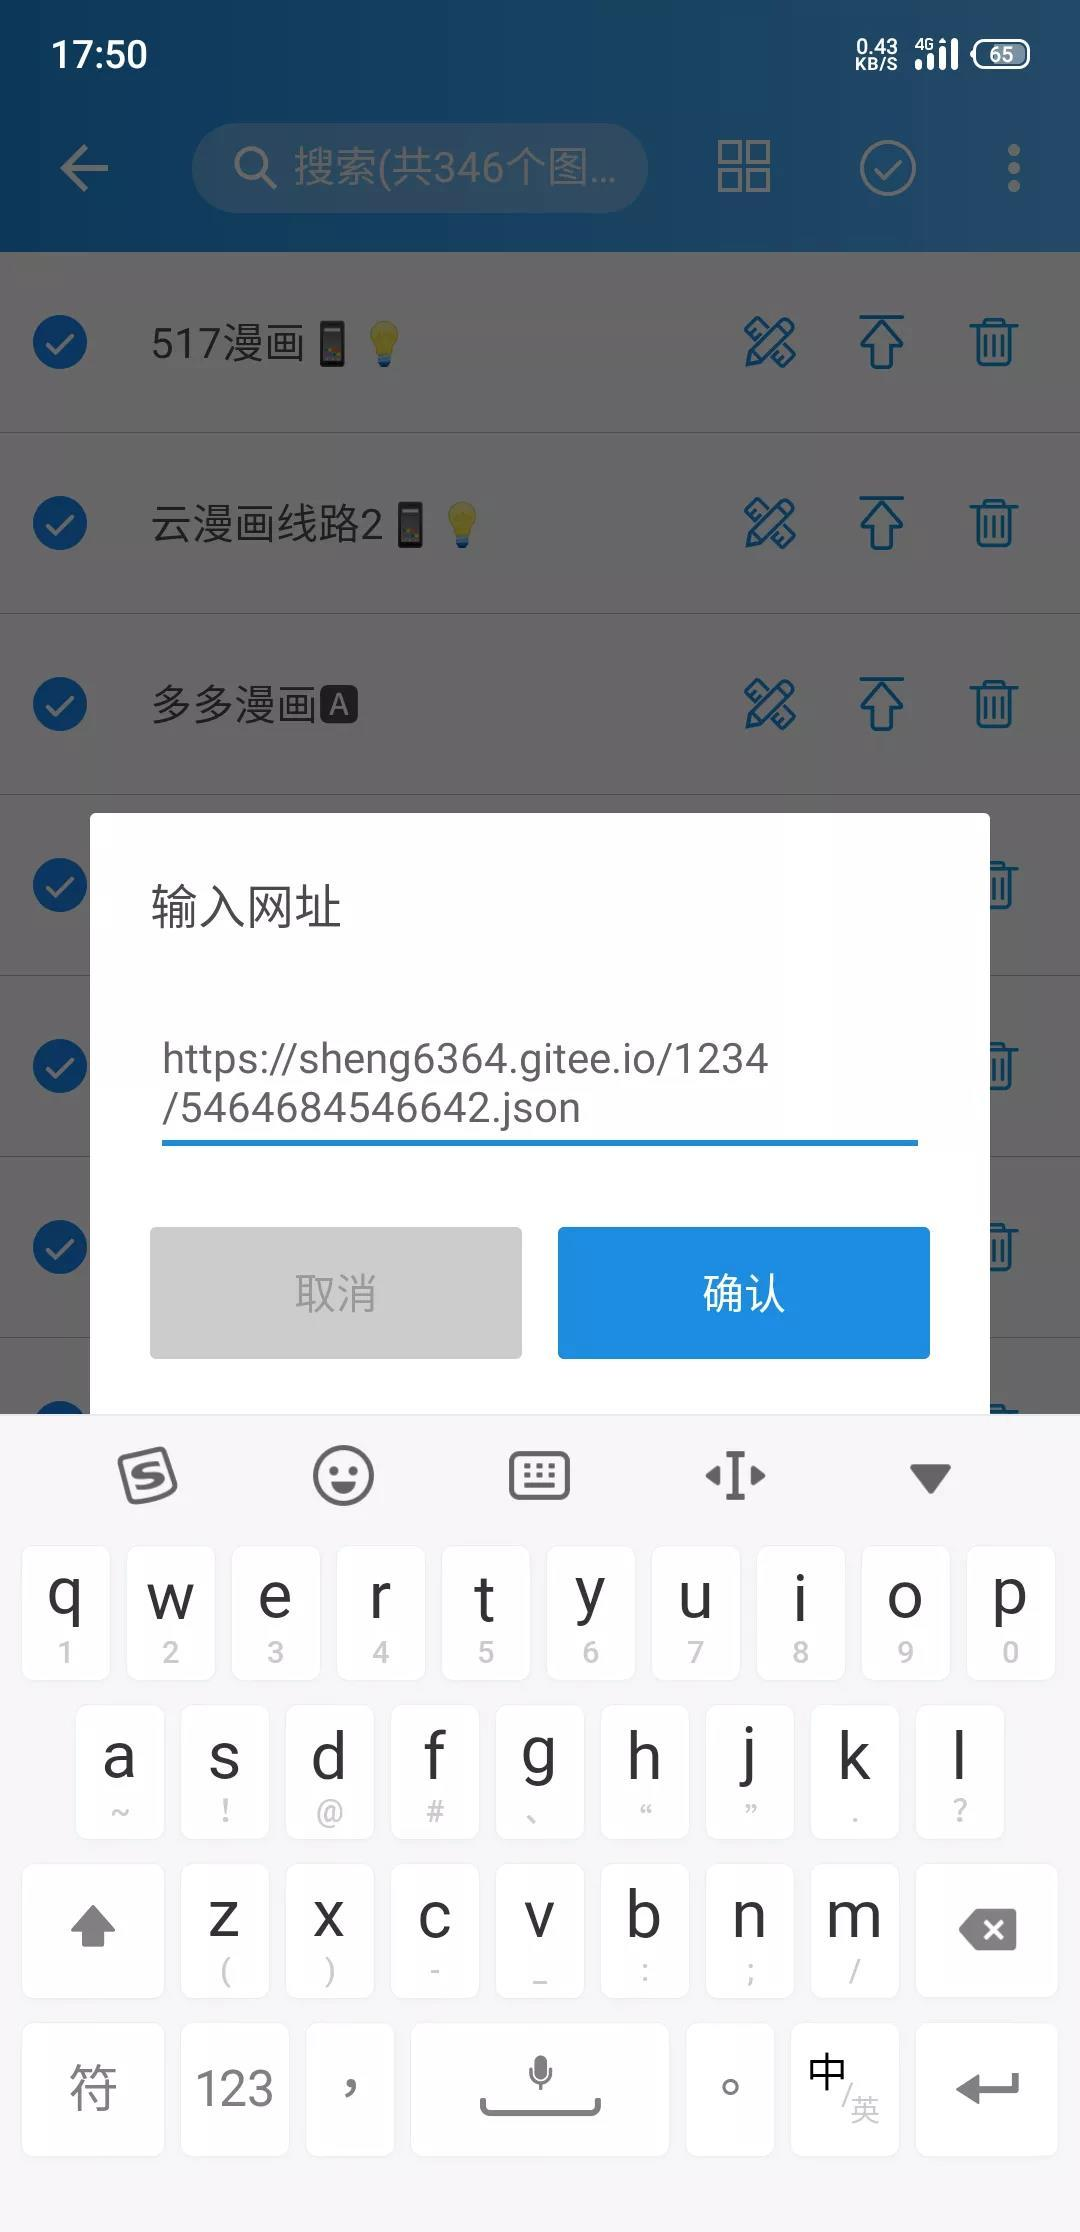 600281943ffa7d37b3ce9d1d 官方提供的图源链接内涵300+搜索网站--异次元